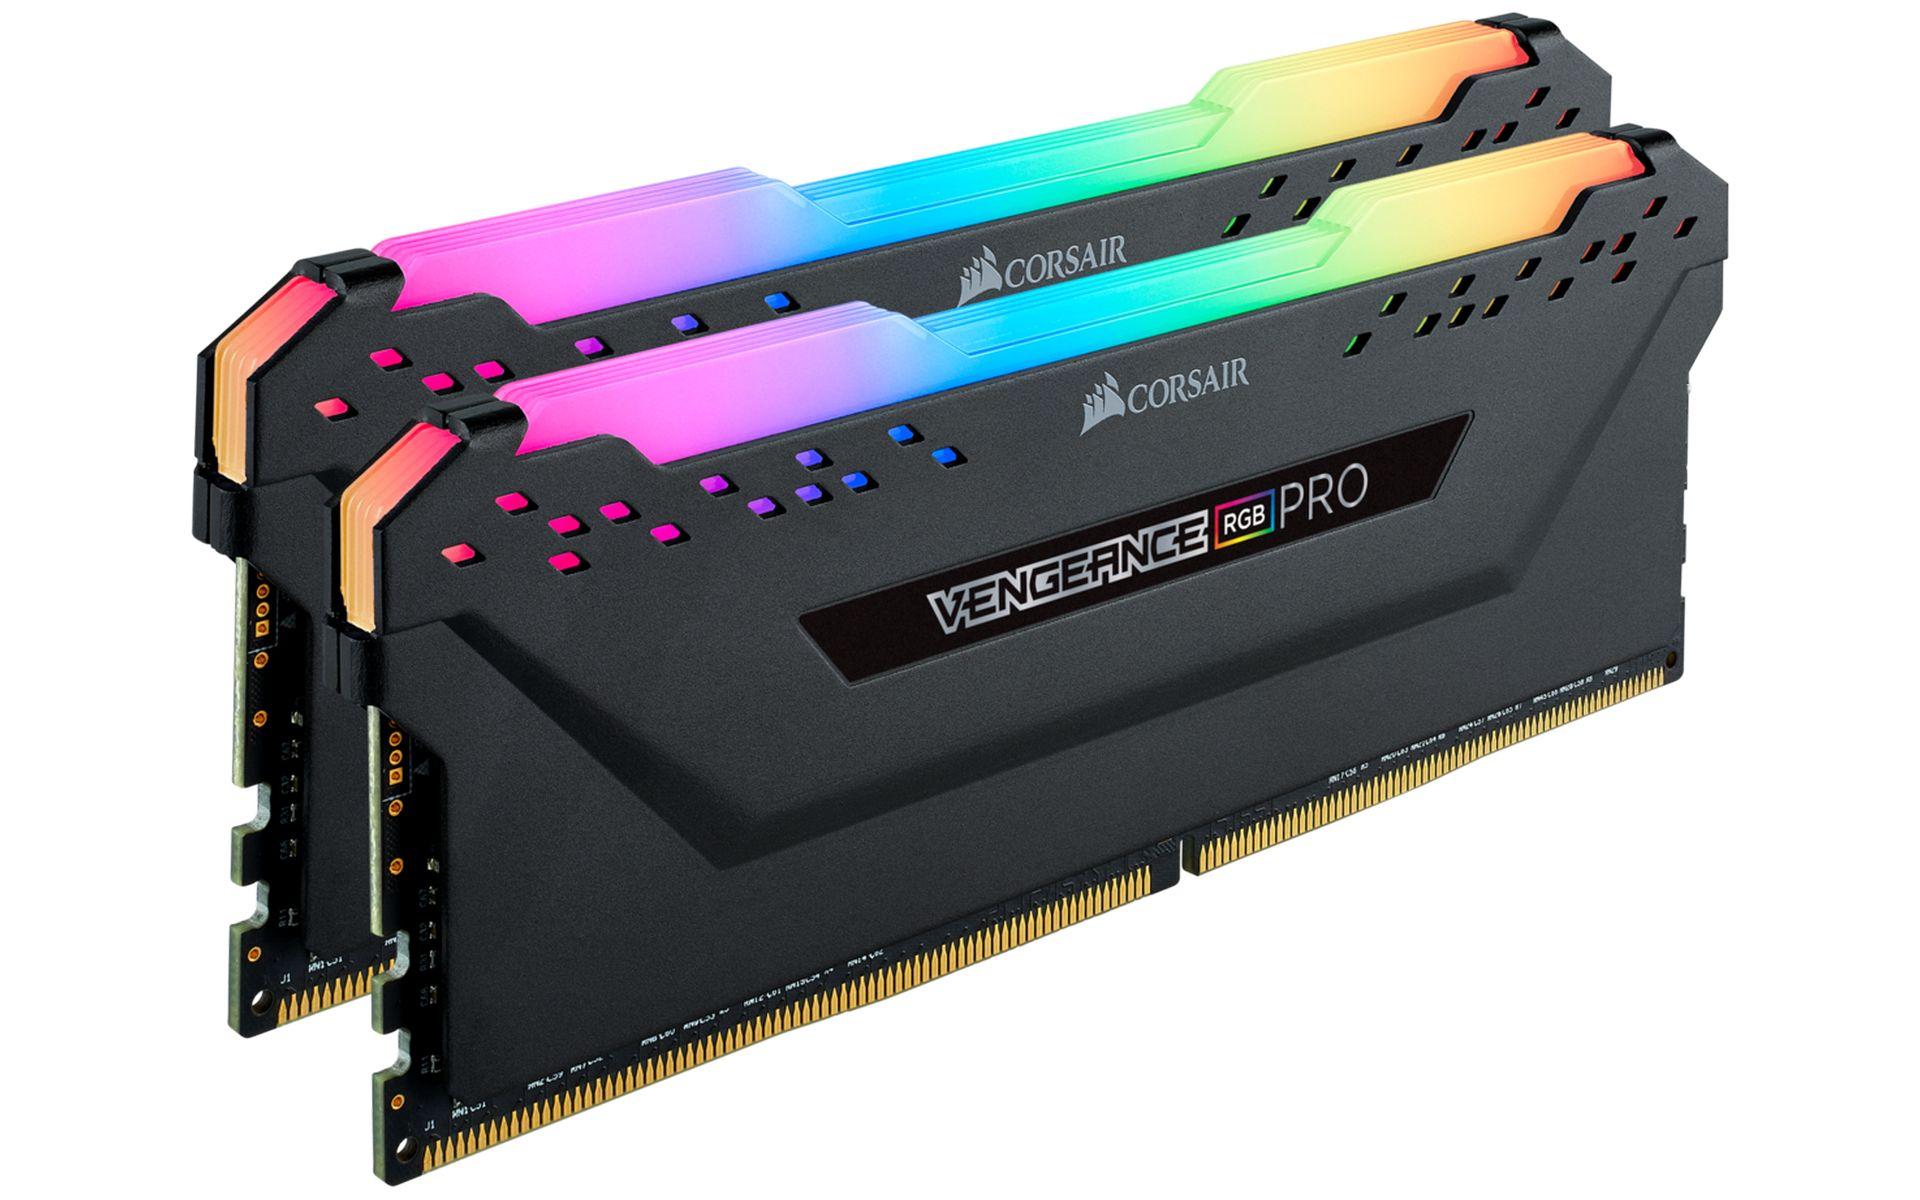 Ram Corsair Vengeance PRO RGB 32GB (2x16GB) DDR4 3600MHz